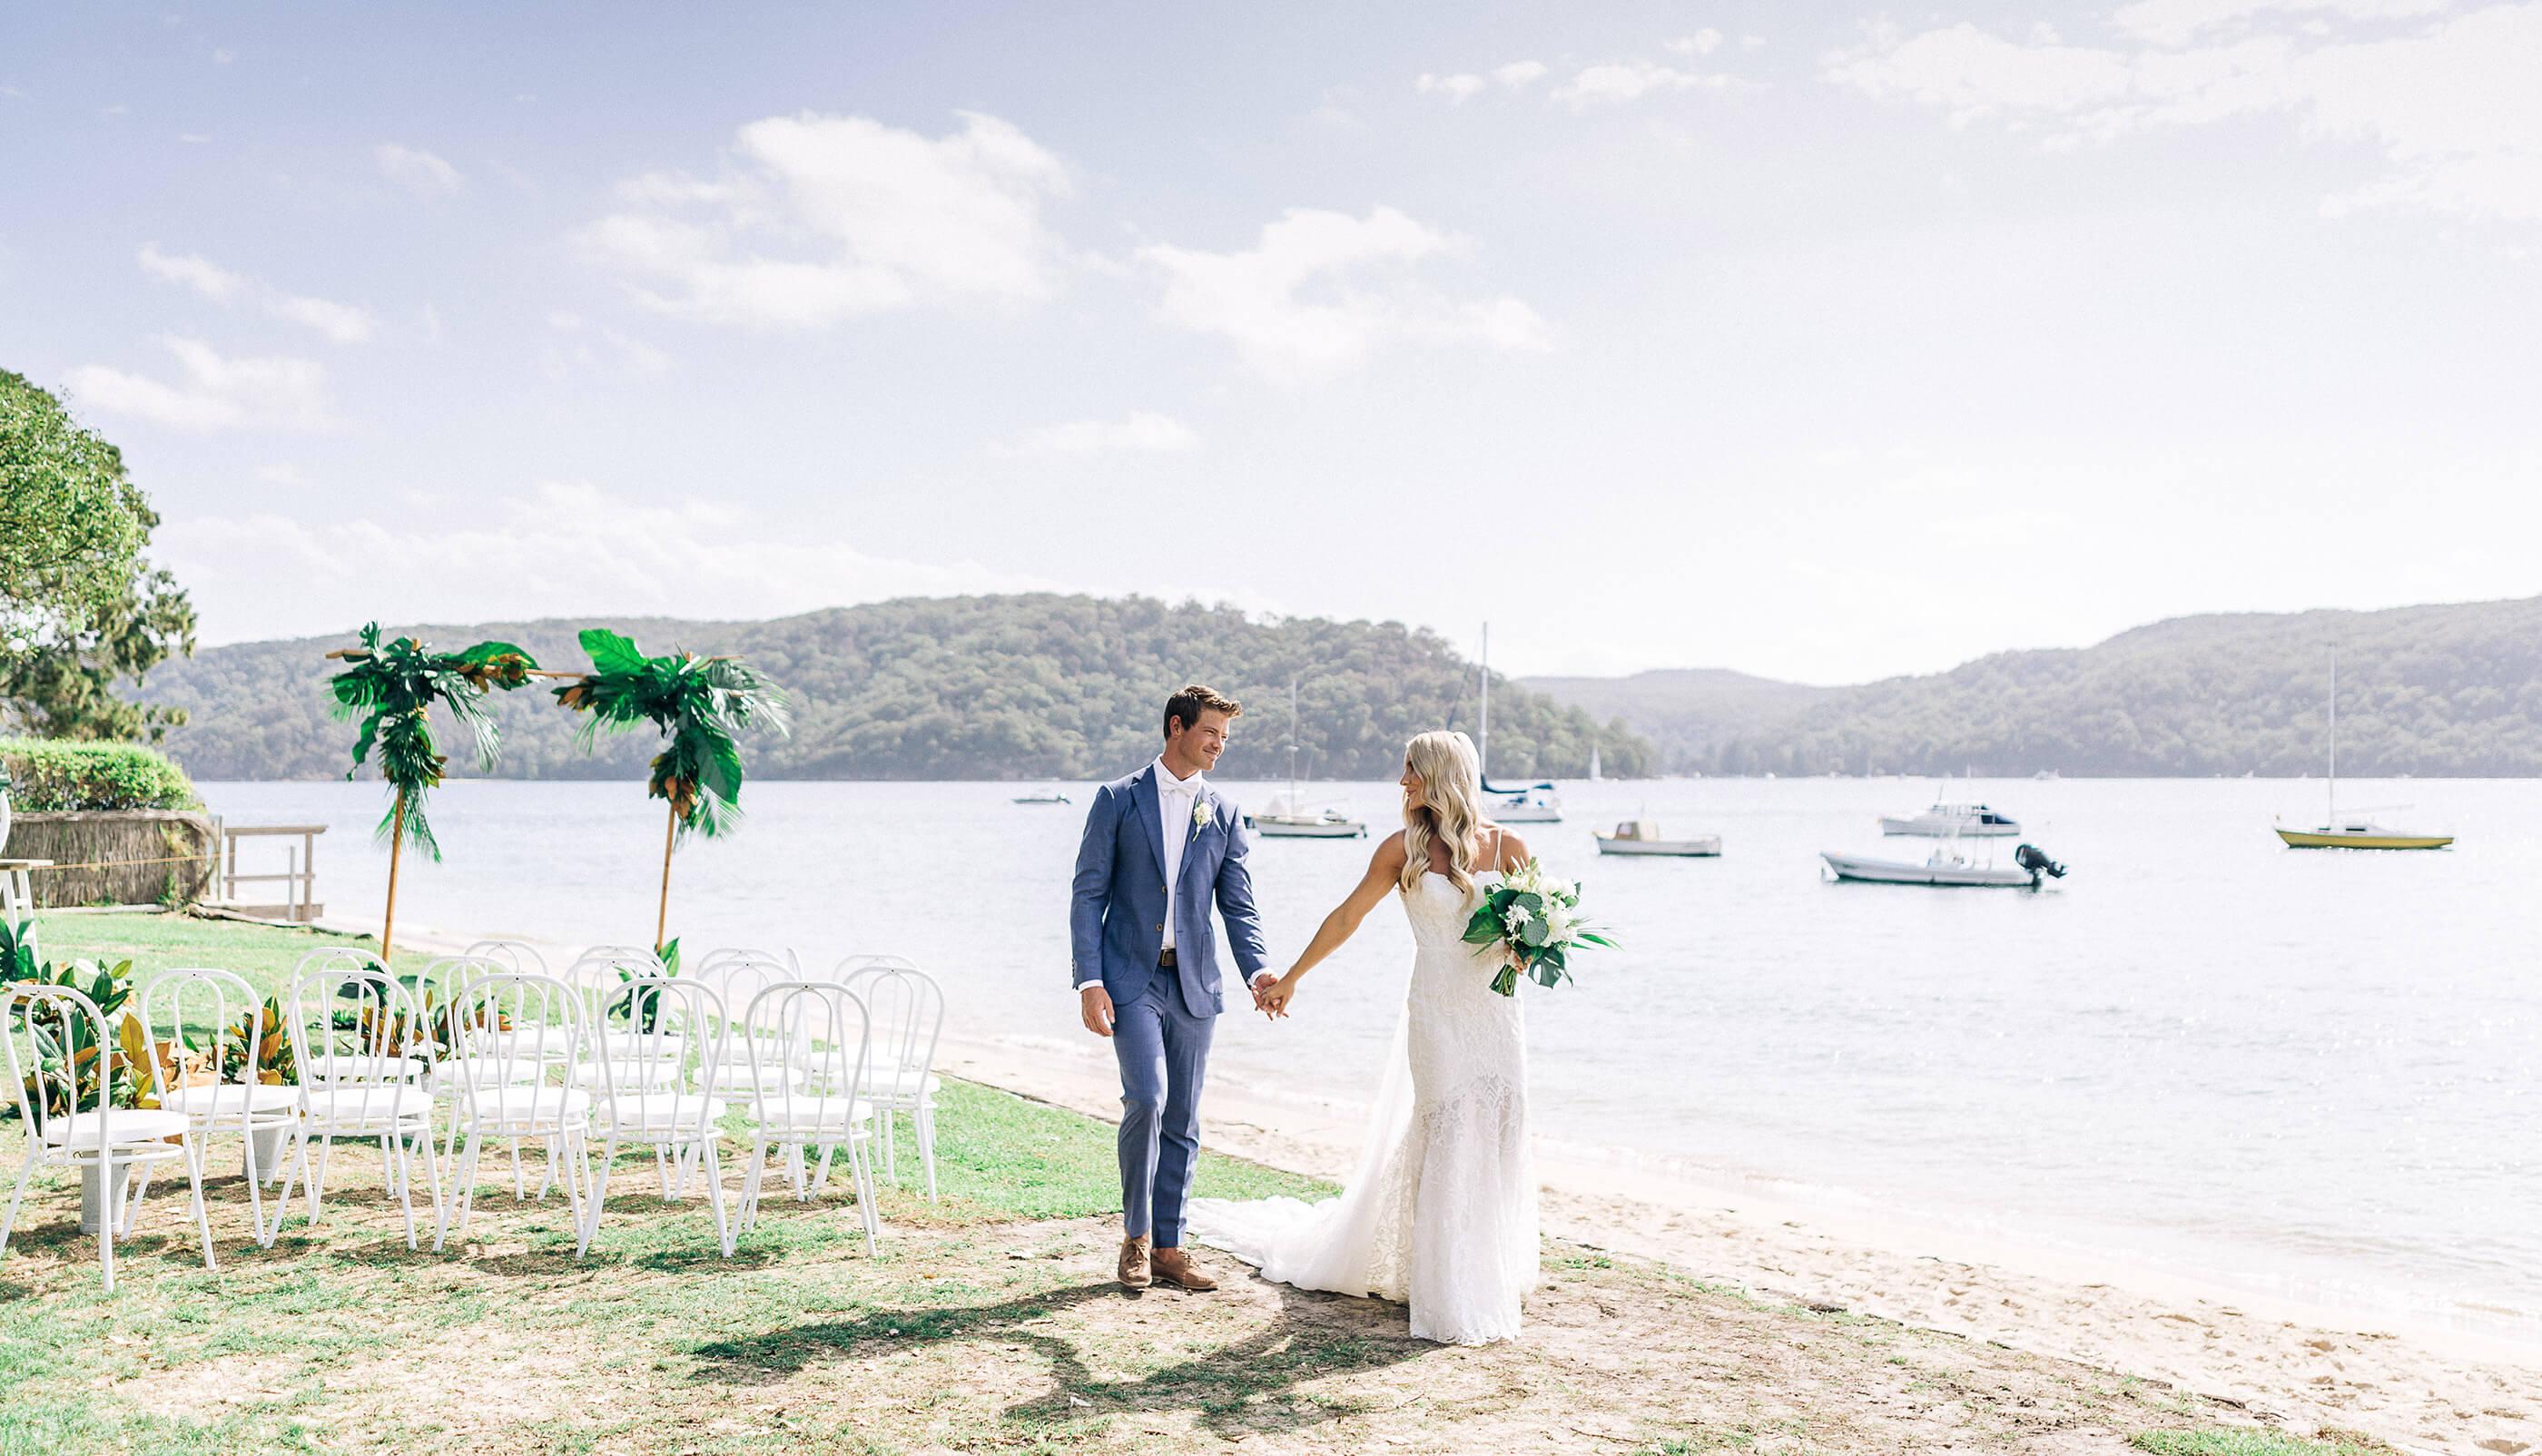 Palm_Beach_Moby_Dicks_Wedding photographer bride and groom walking